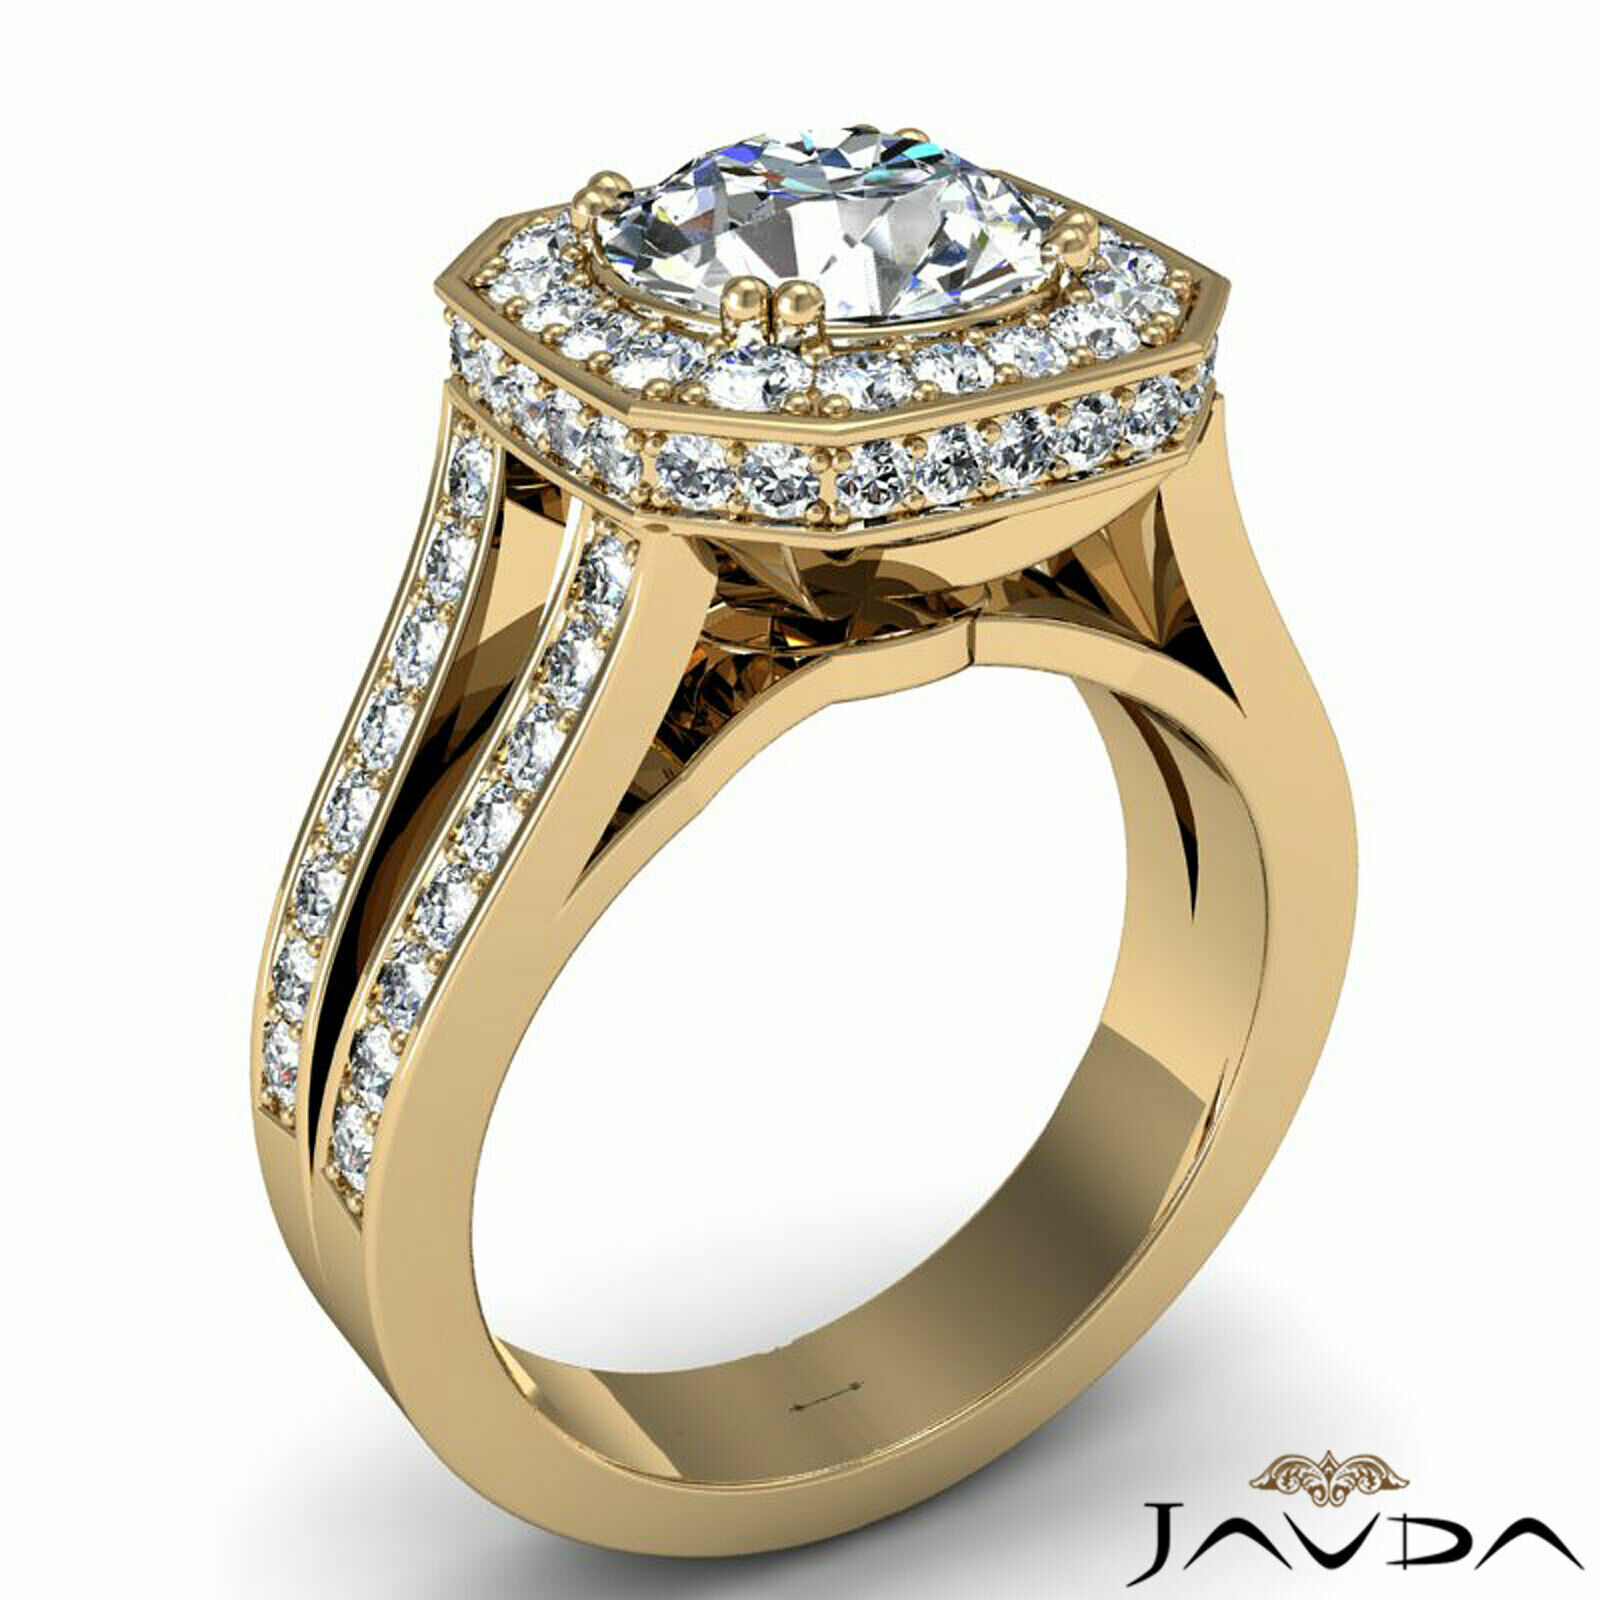 Hexagon Halo Split Shank Round Diamond Engagement Ring GIA F VS1 Clarity 2.84Ct 7